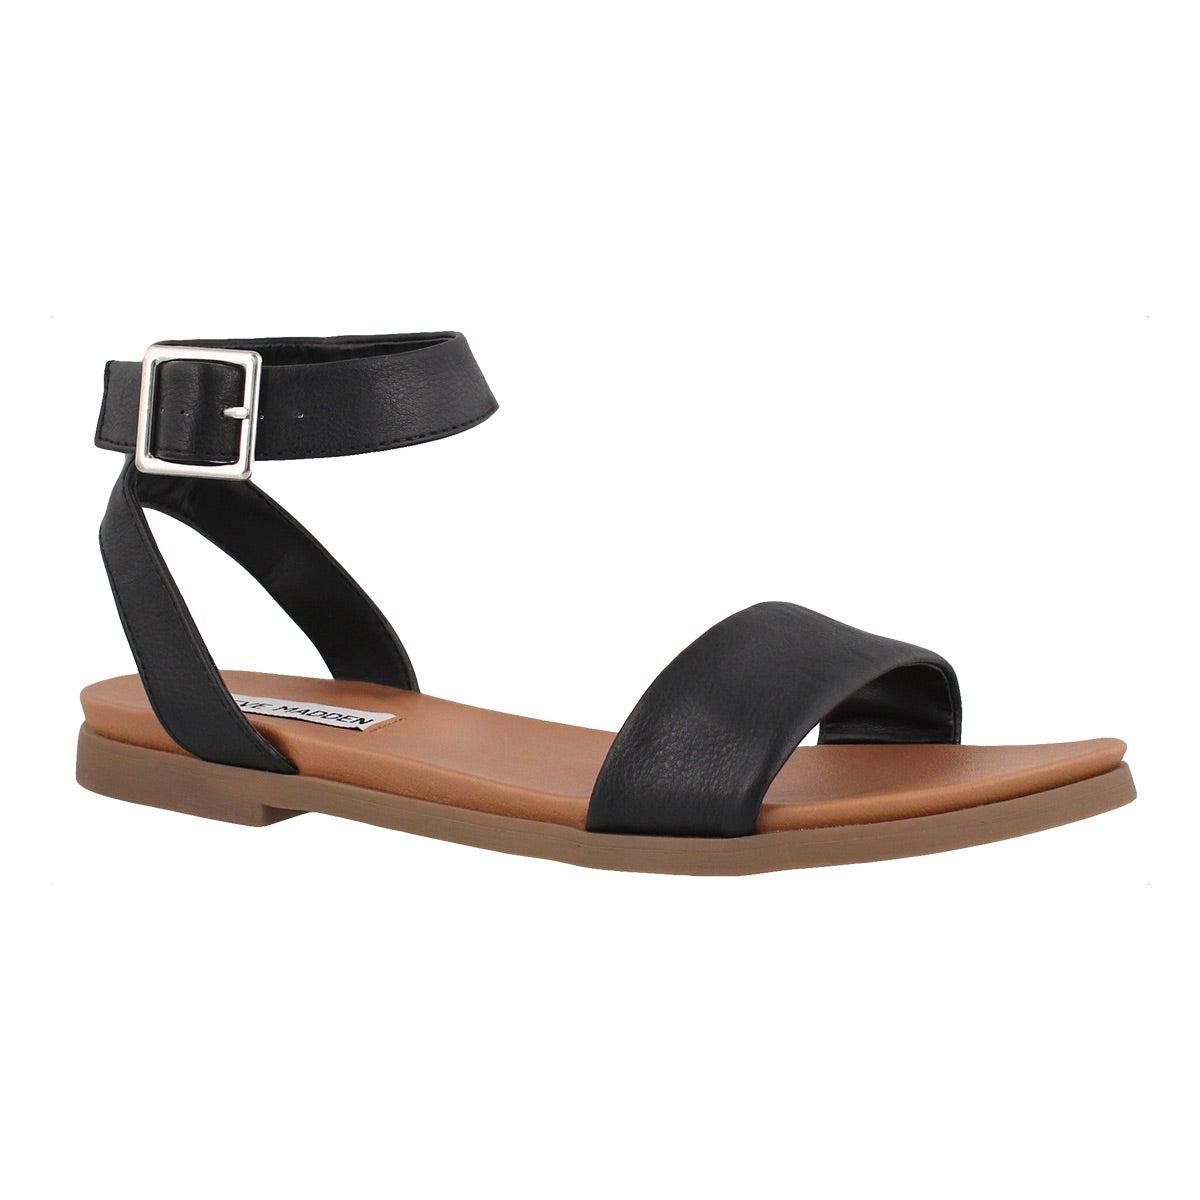 Sandals for Women On Sale, Black, Leather, 2017, 3.5 4.5 5.5 6 6.5 7.5 Steve Madden